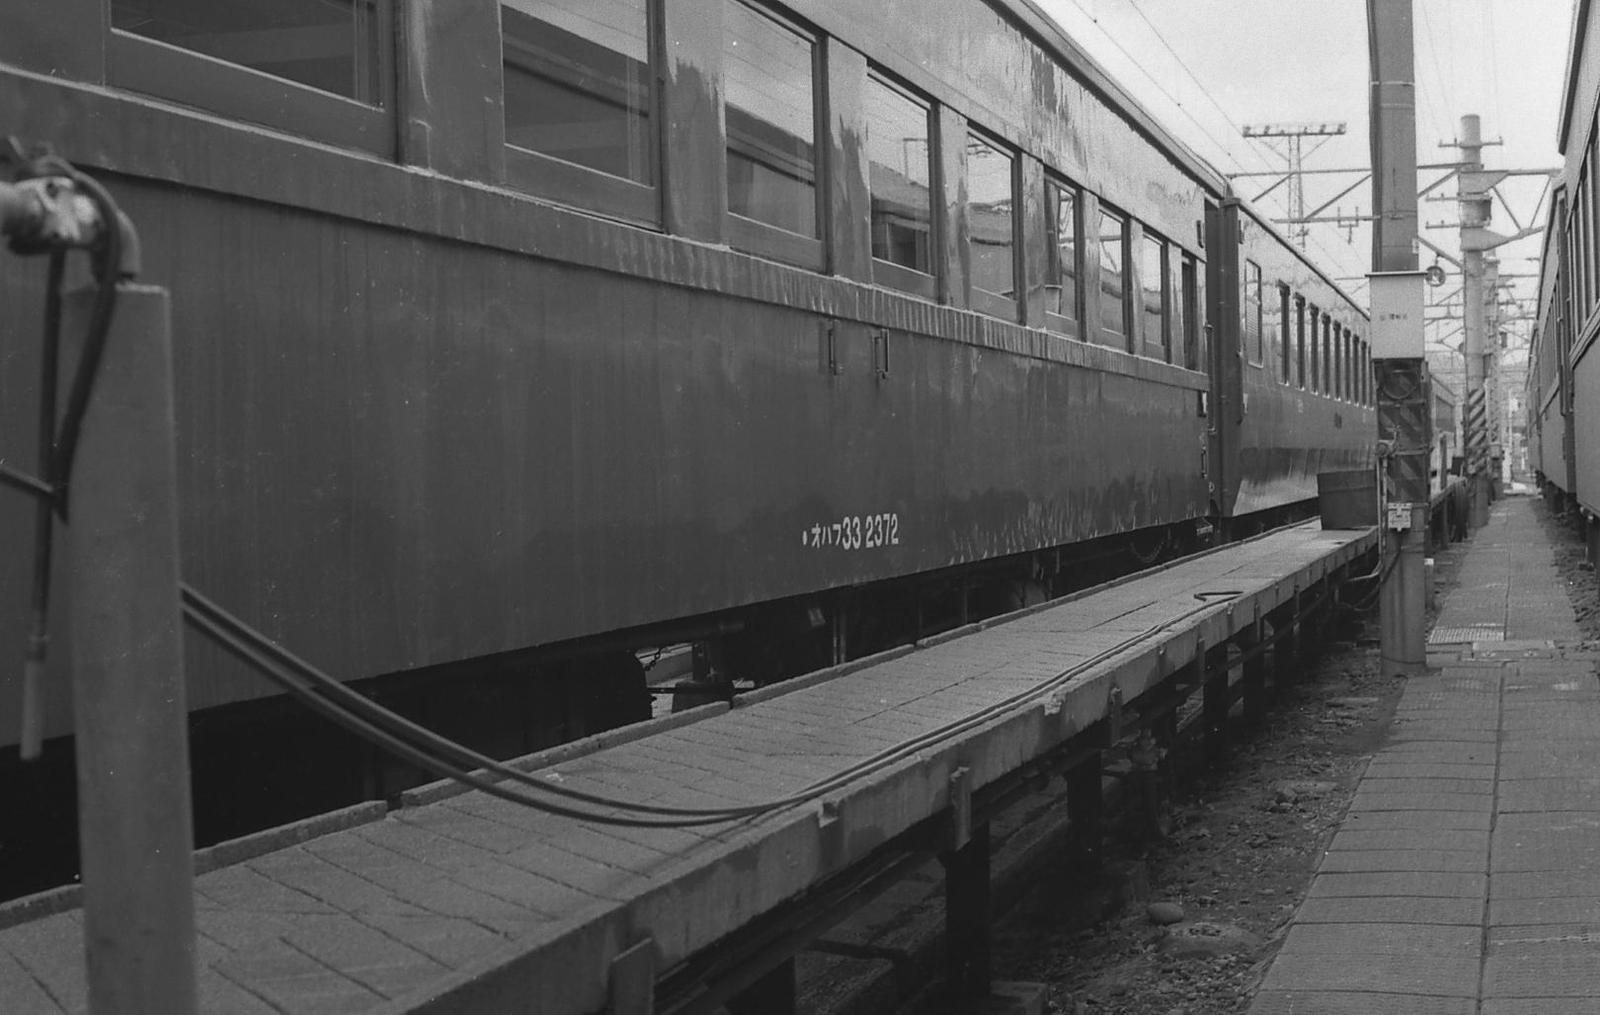 19791202c22